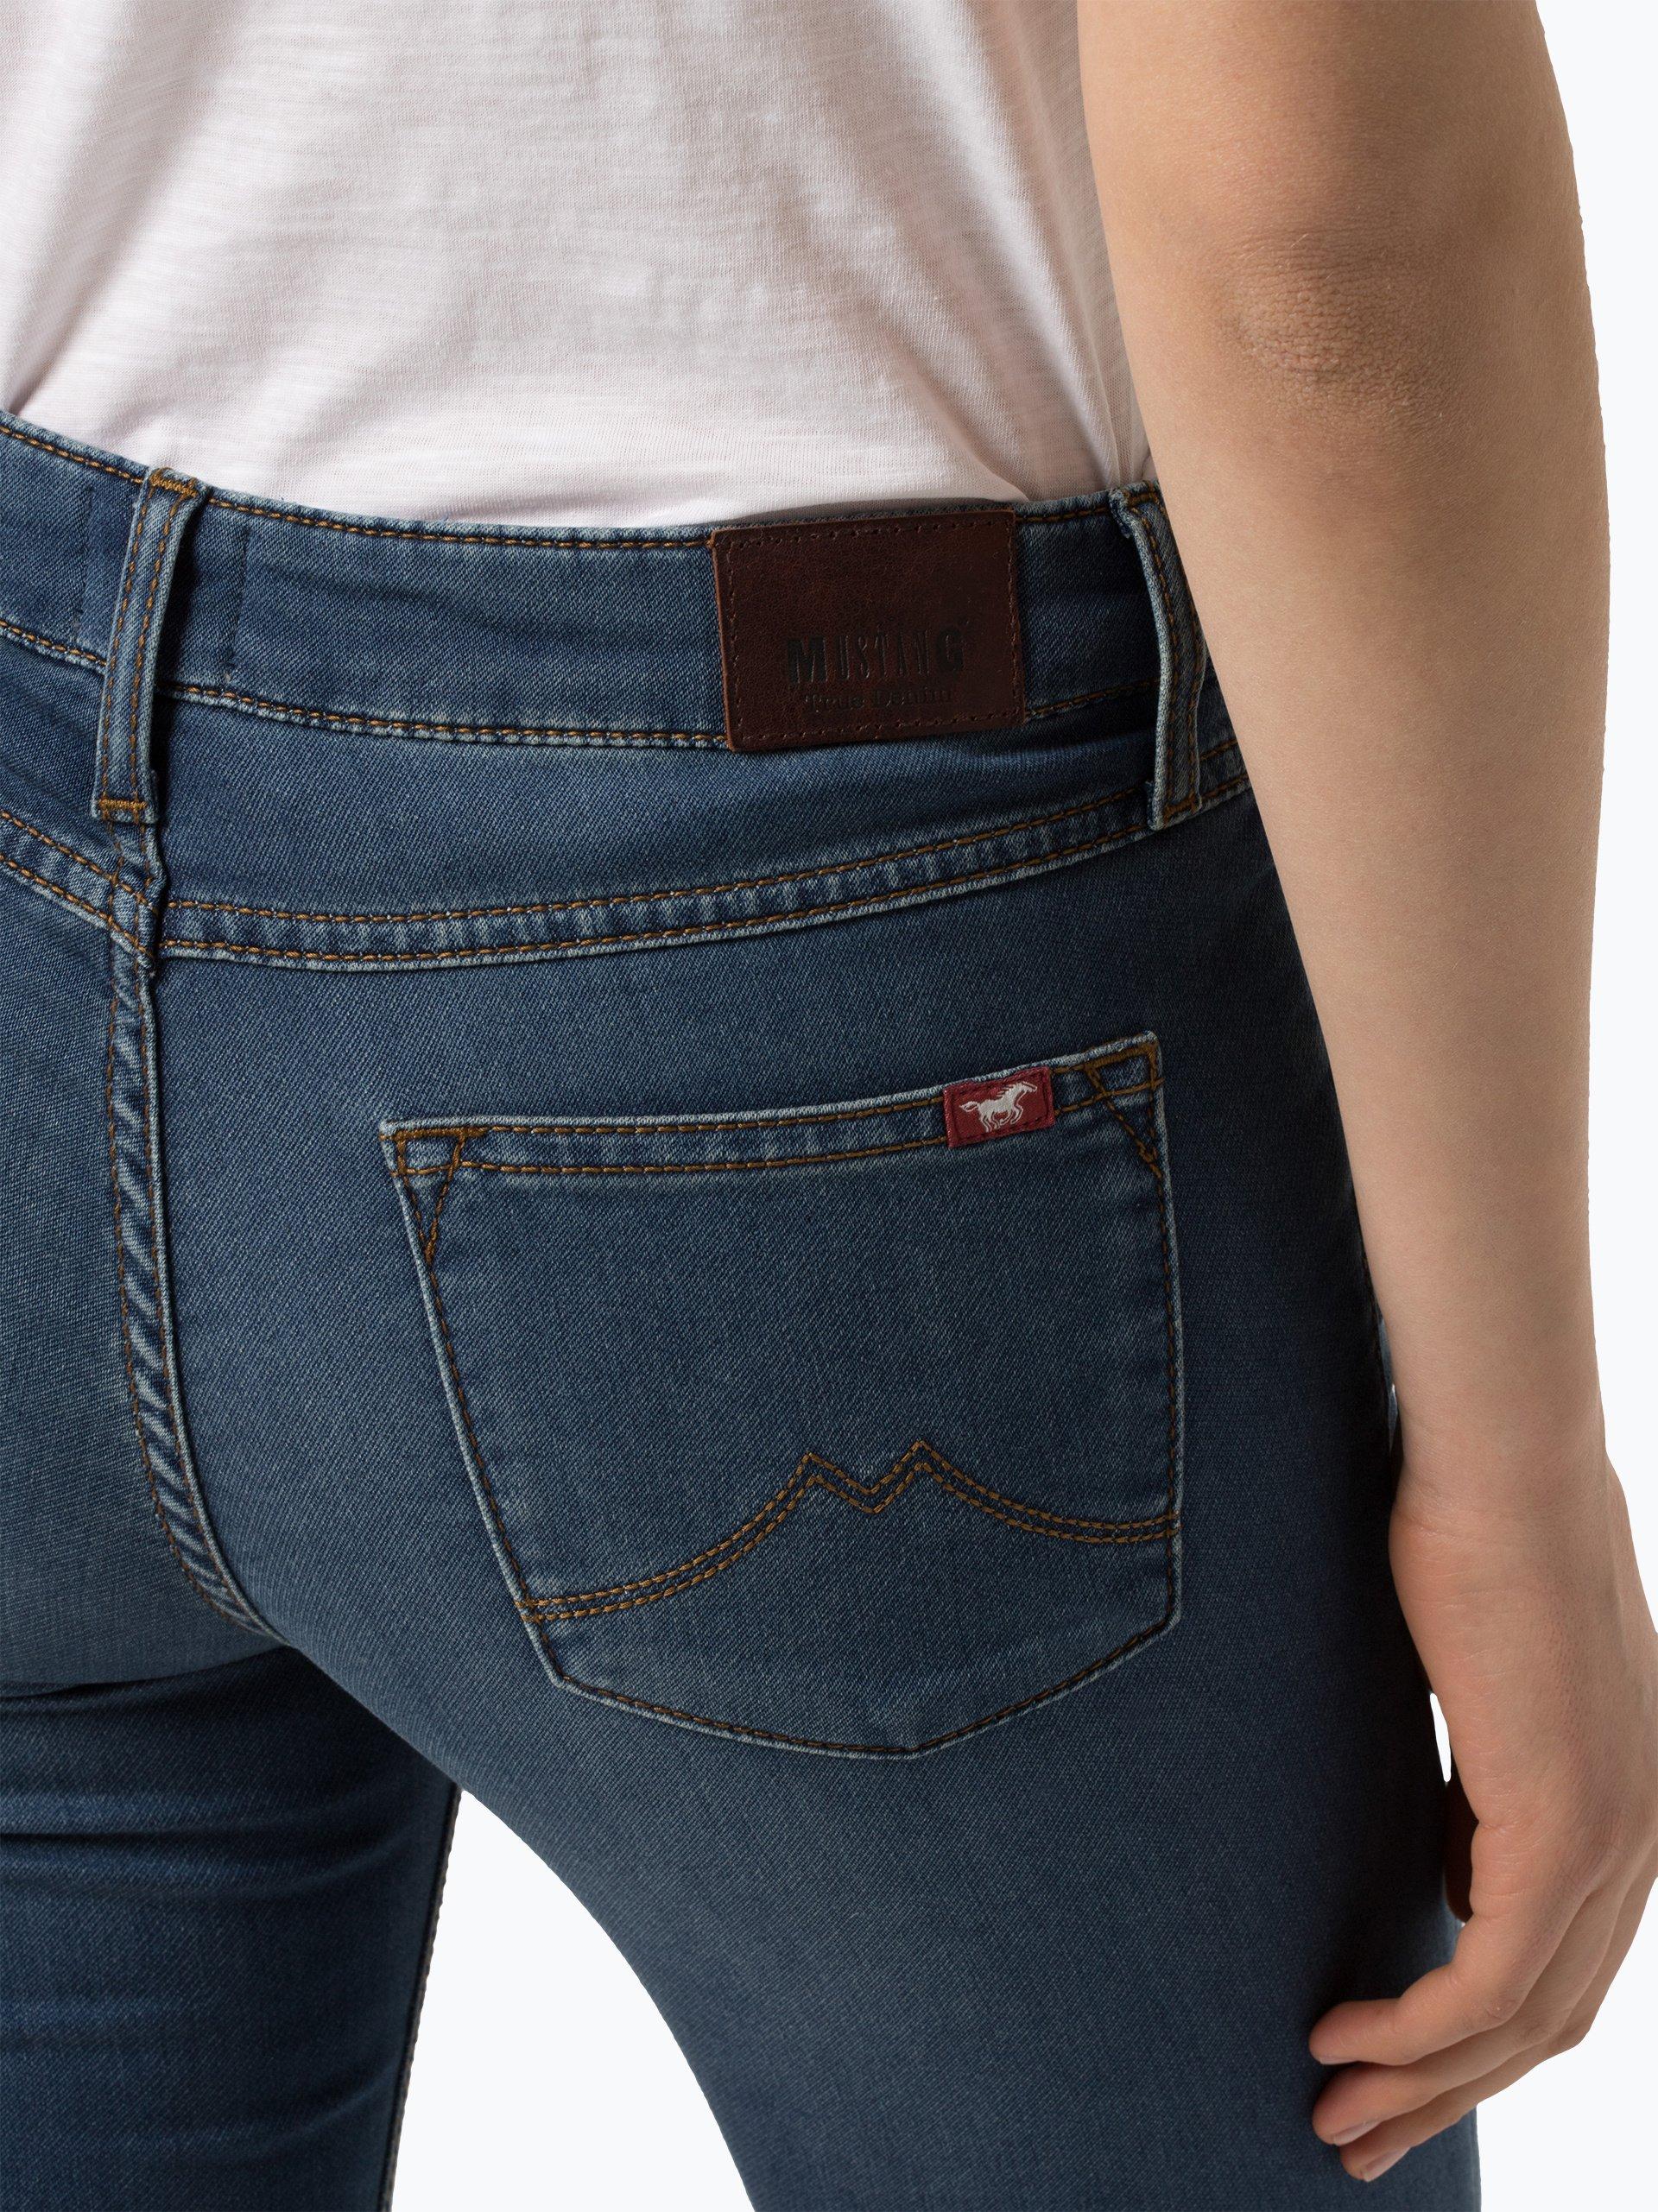 mustang damen jeans jasmin 7 8 online kaufen vangraaf com. Black Bedroom Furniture Sets. Home Design Ideas